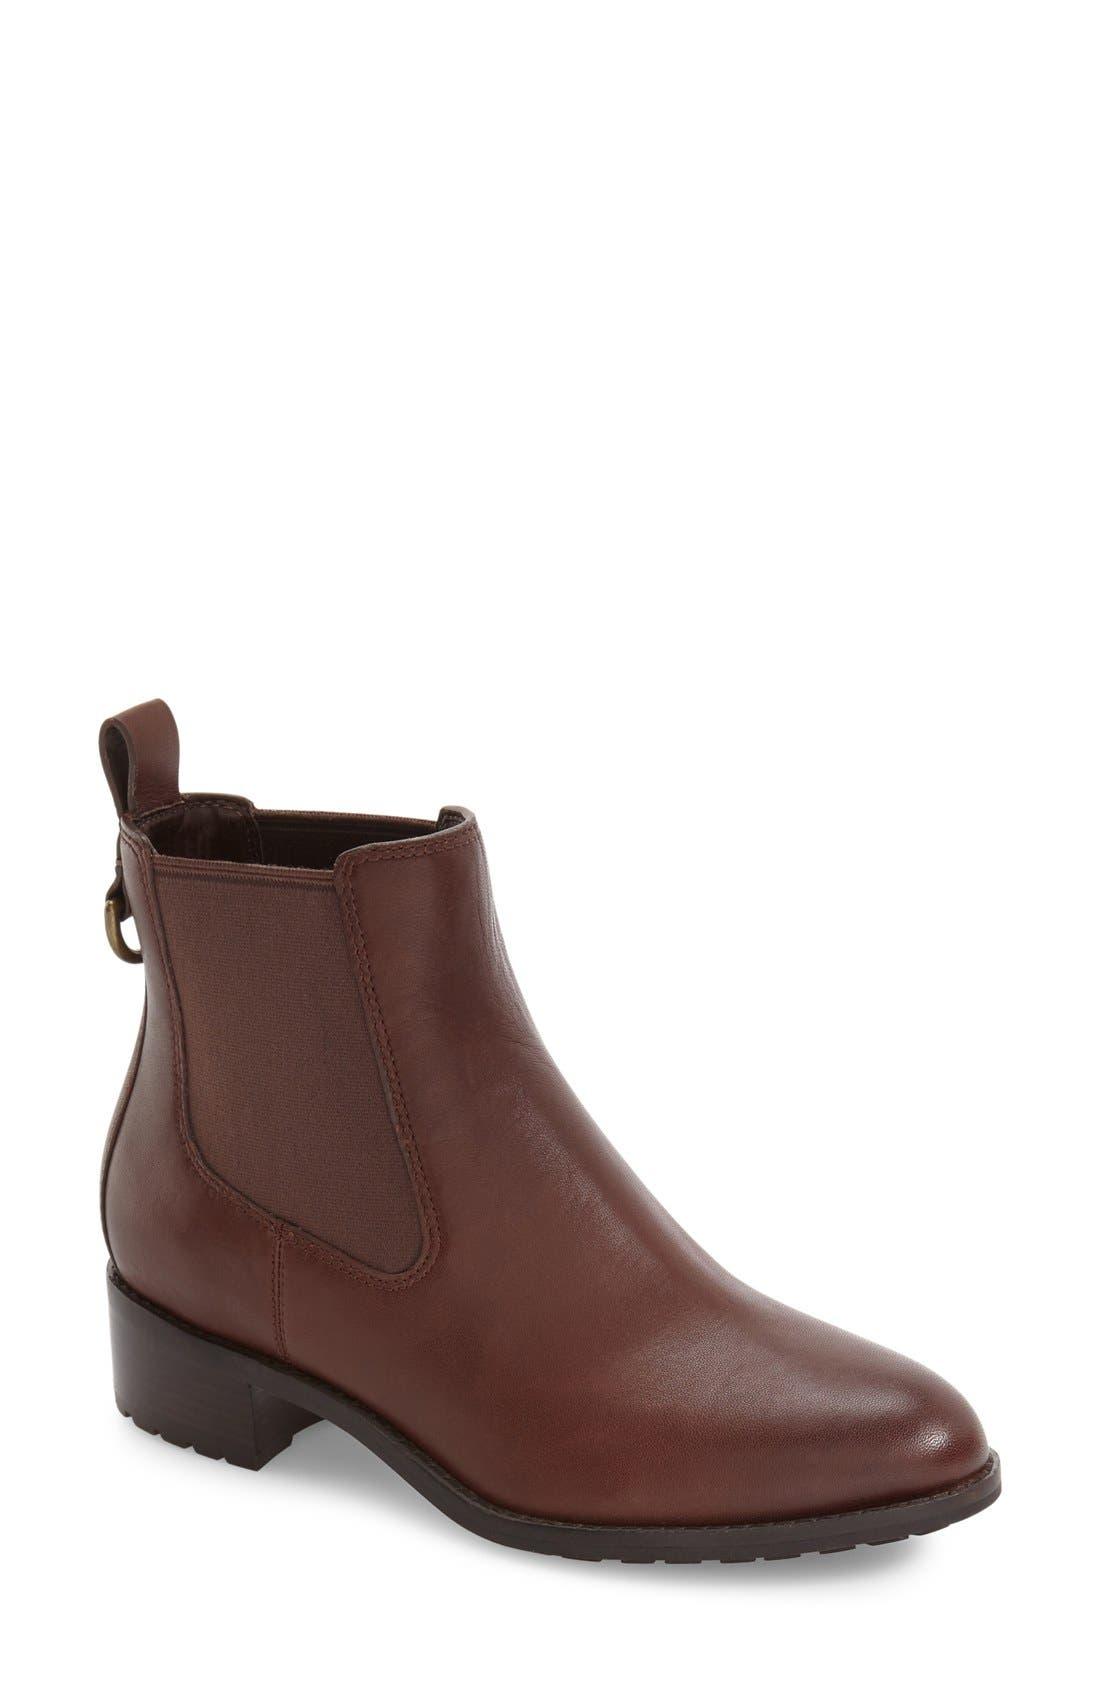 COLE HAAN Newburg Waterproof Chelsea Boot, Main, color, CHESTNUT LEATHER